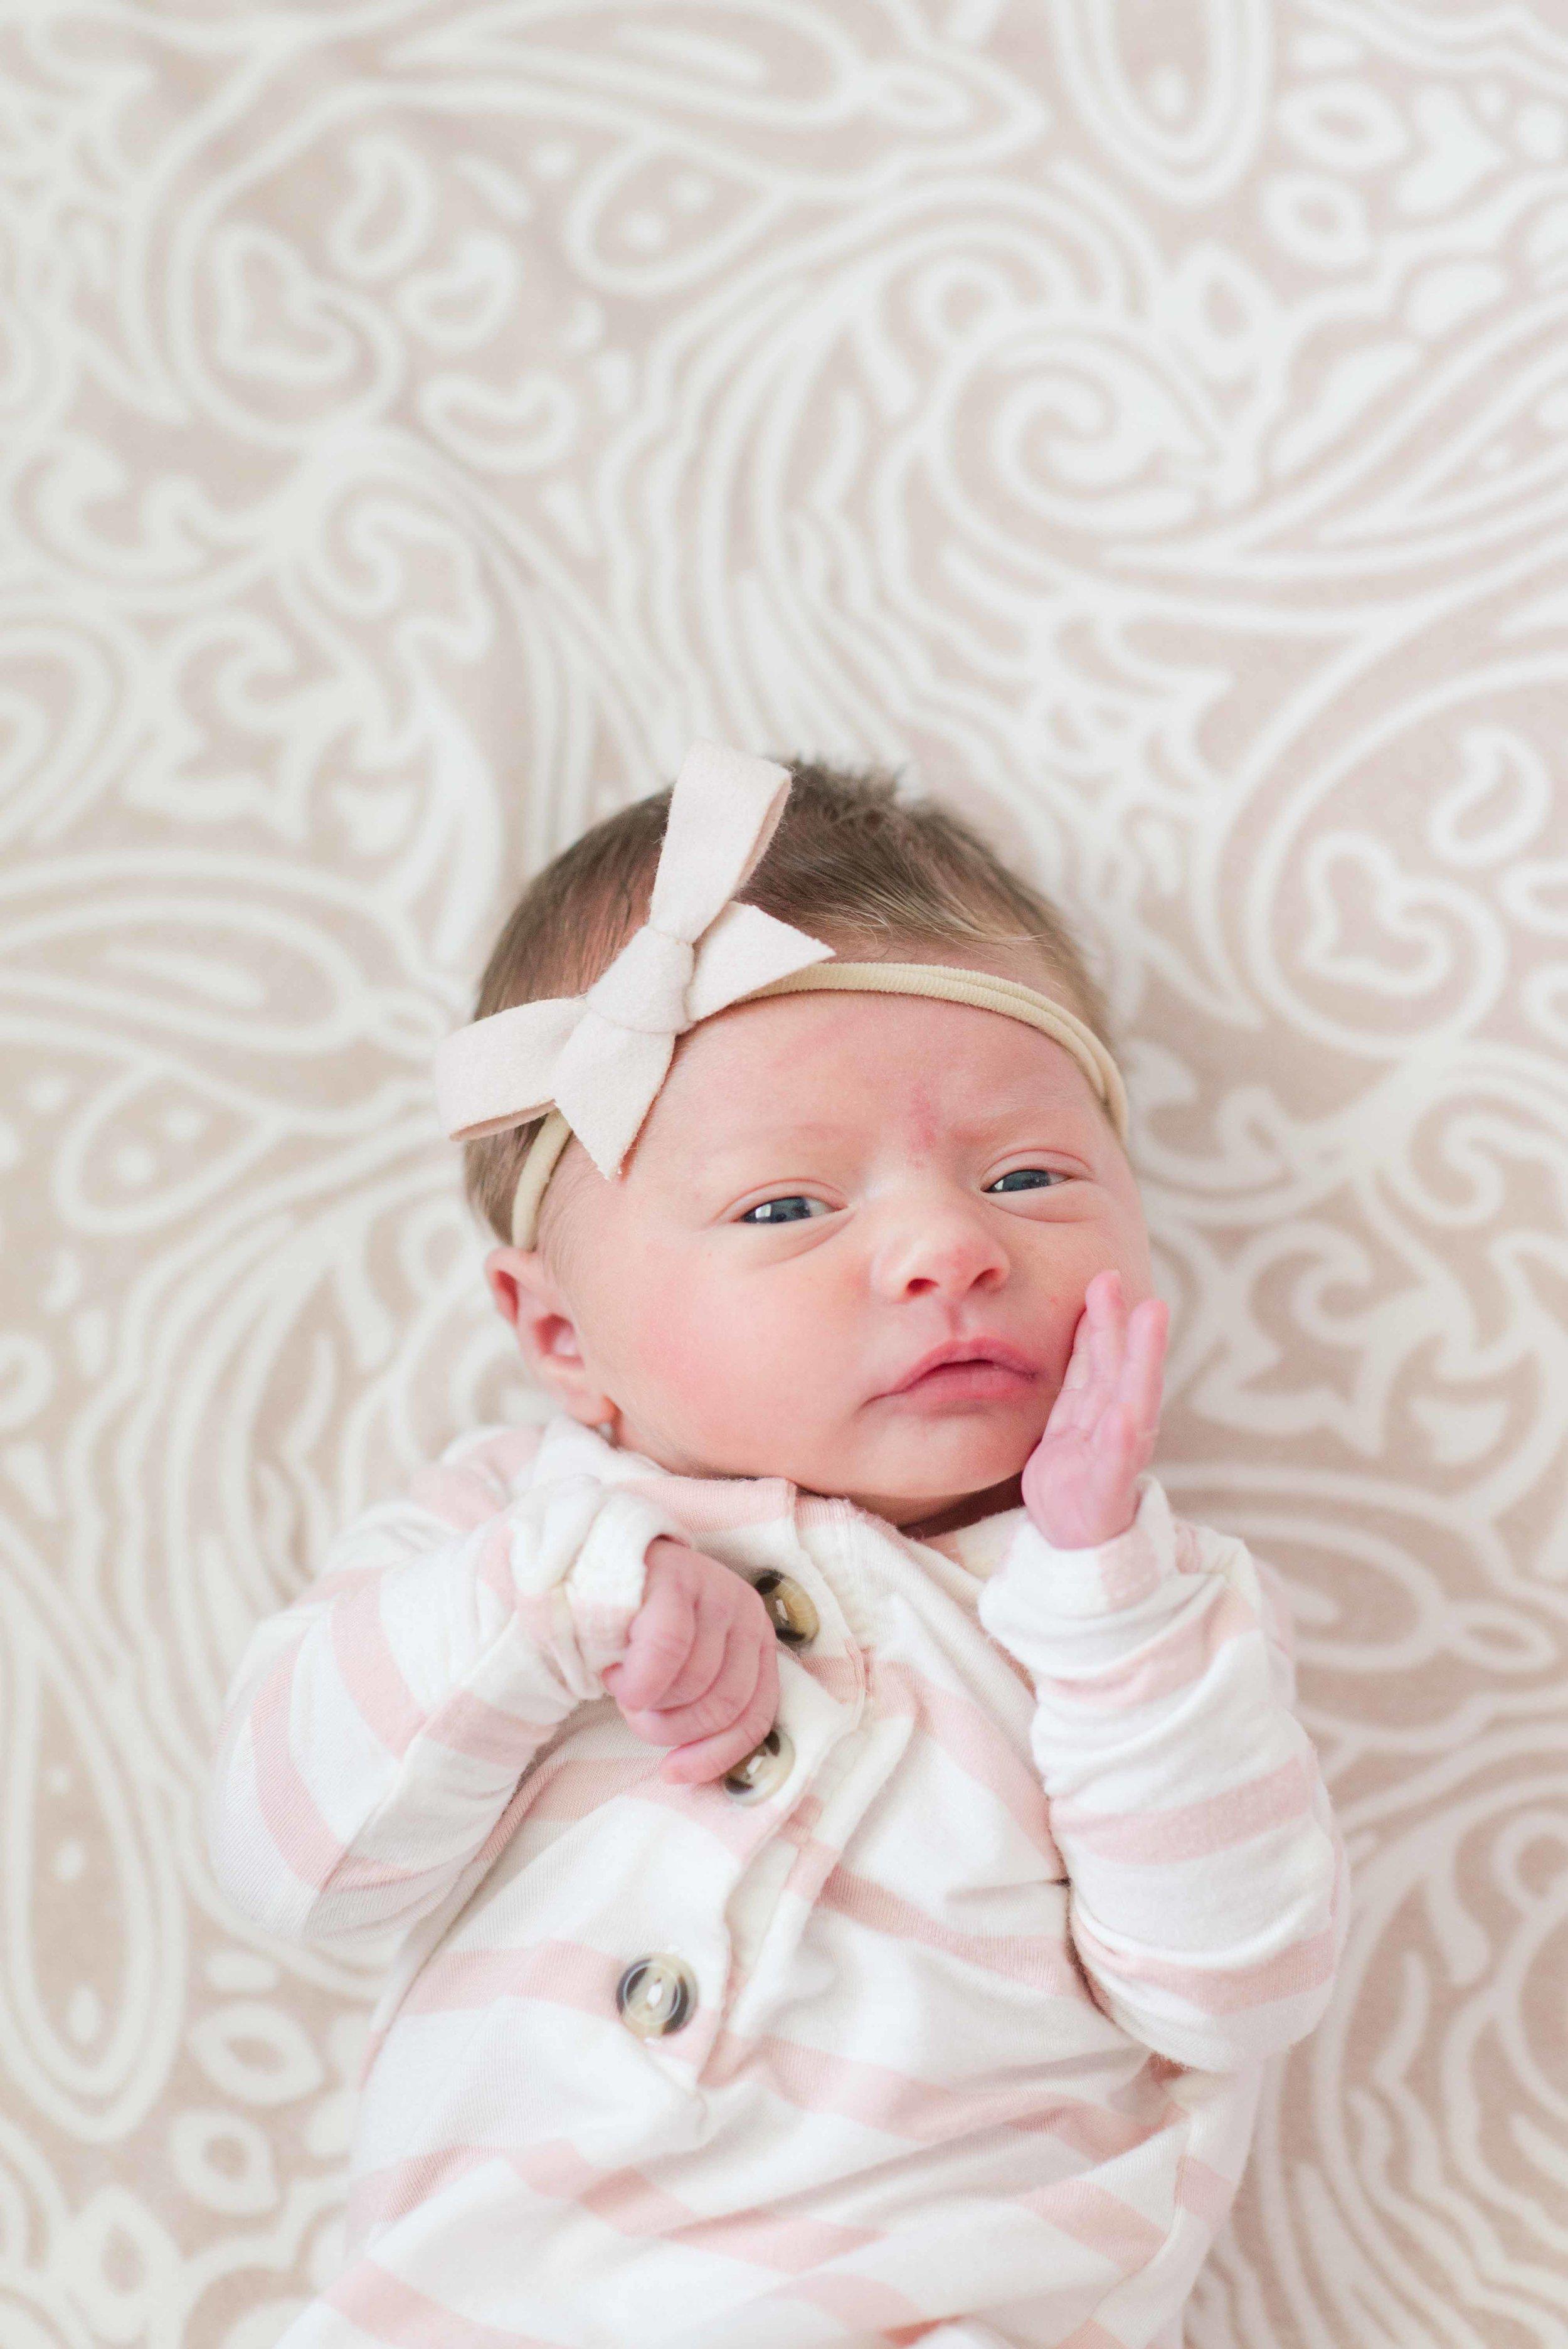 Lifestyle Newborn Portrait Session Alabama Photography Deborah Michelle Photography